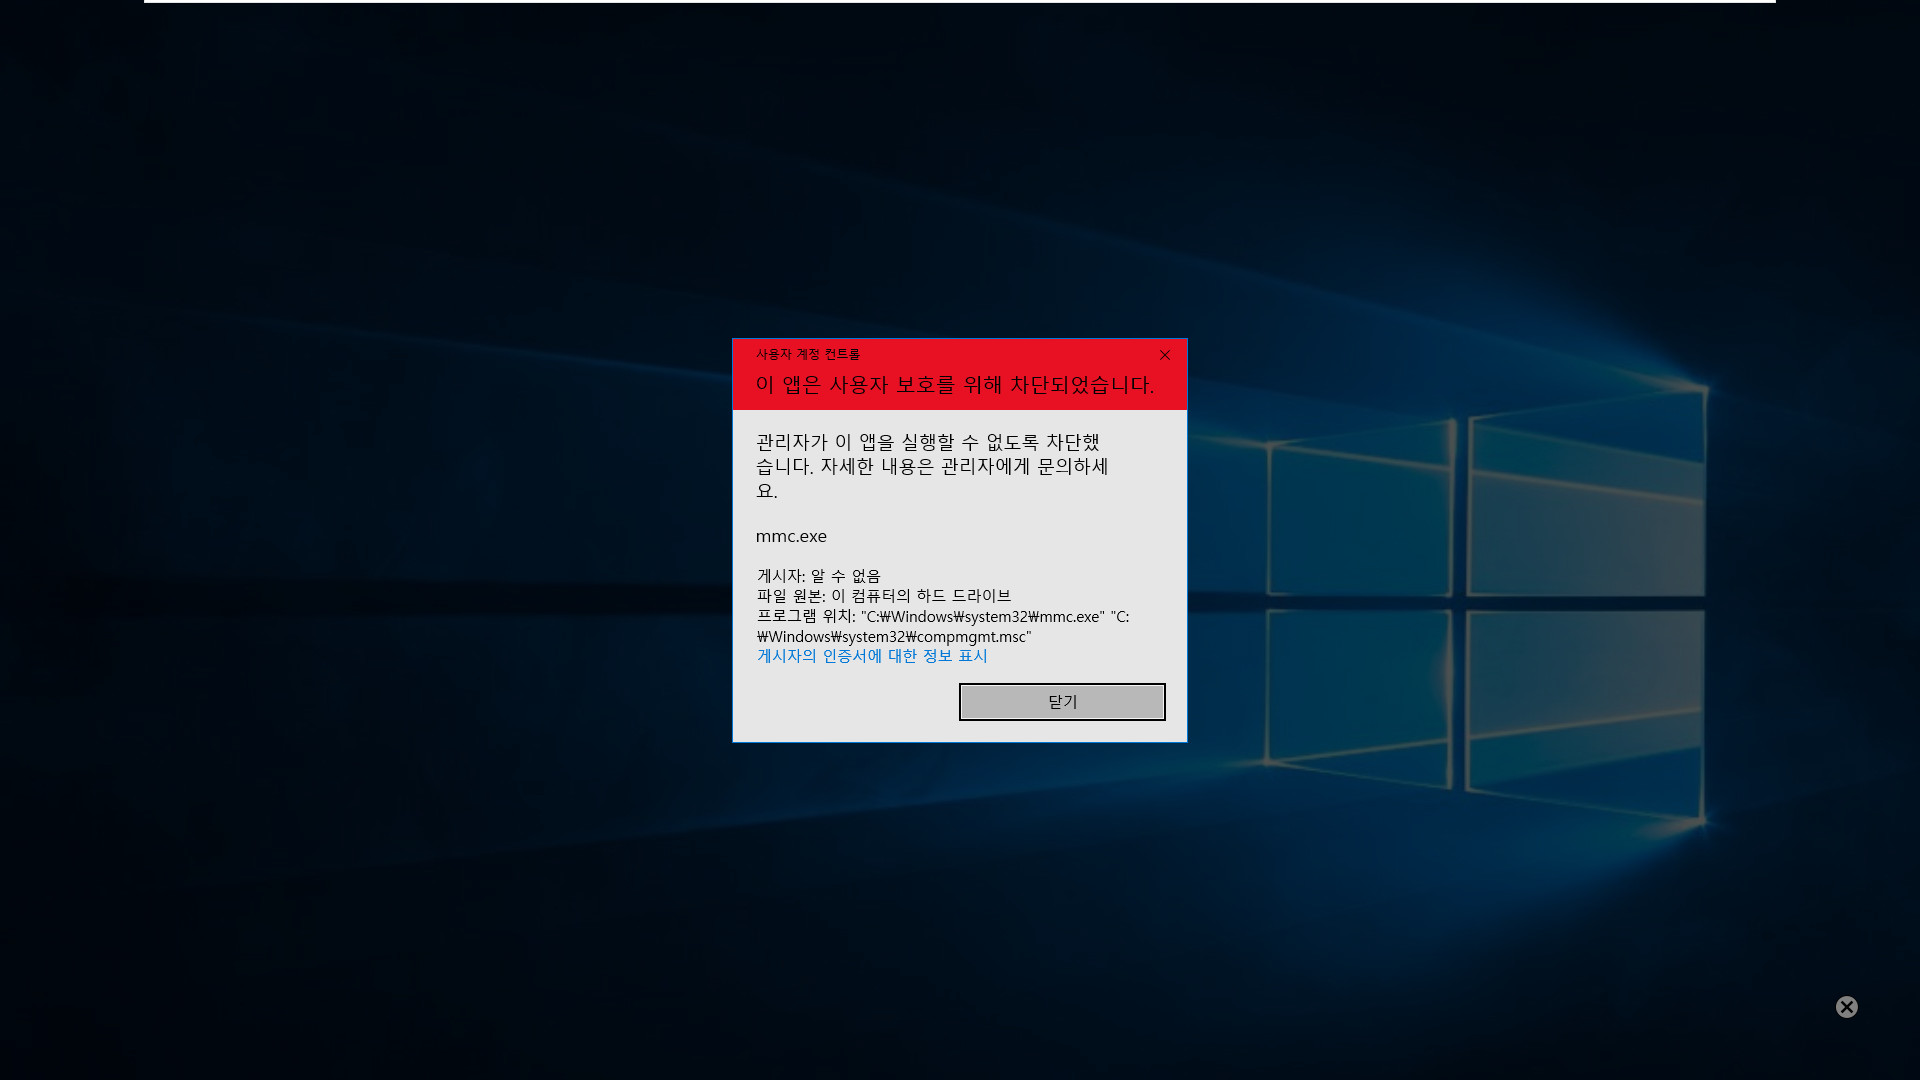 Windows 10 업데이트 방지하기 [업데이트 다운로드 폴더 사용 금지].bat 테스트 - 버전 1803, Home 에서 버전 1903 기능 업데이트 방지하기 - 적용 후에 컴퓨터 관리 불가 상태 해결 방법 2019-11-07_095746.jpg